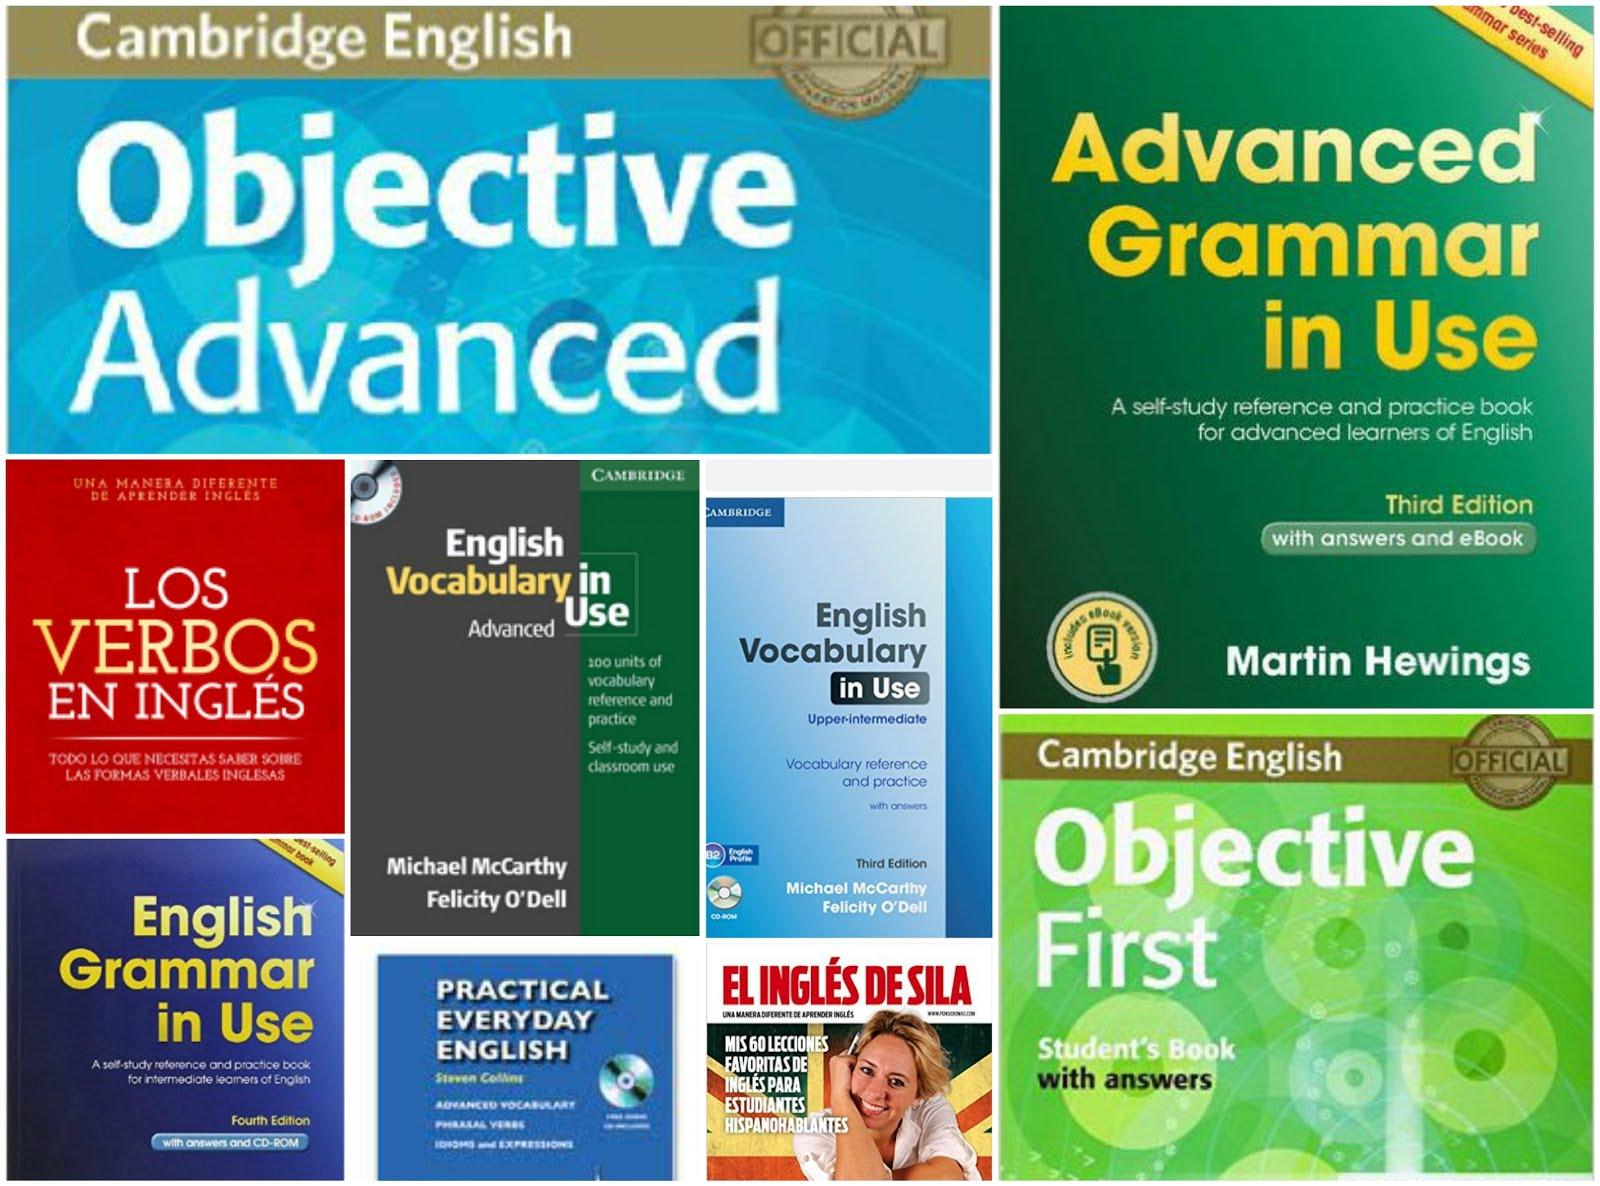 Libros Gratis En Inglés Para Descargar